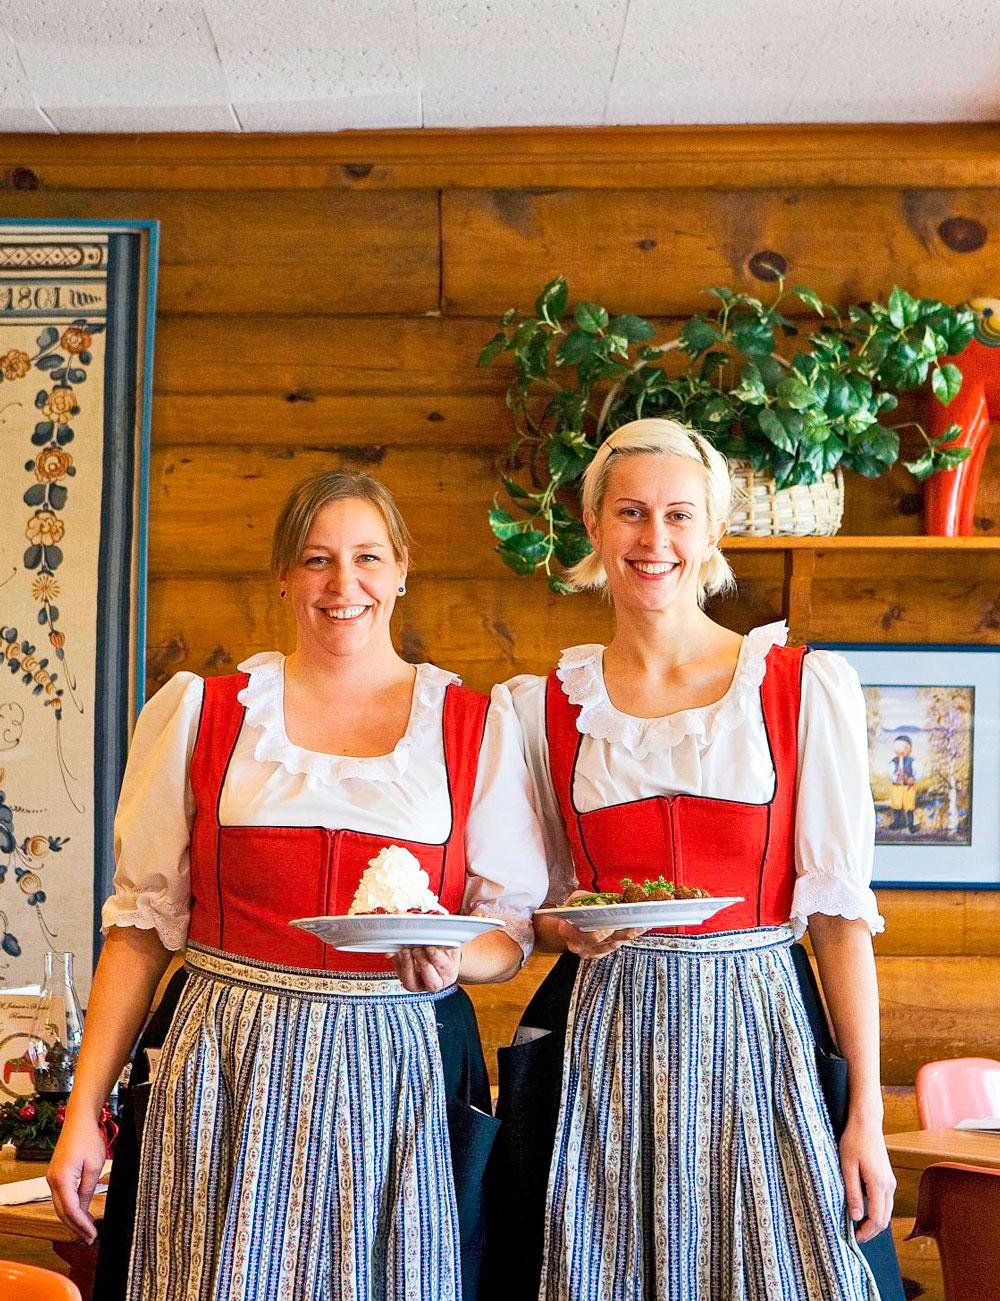 Things to Do in Door County--Iconic restaurants